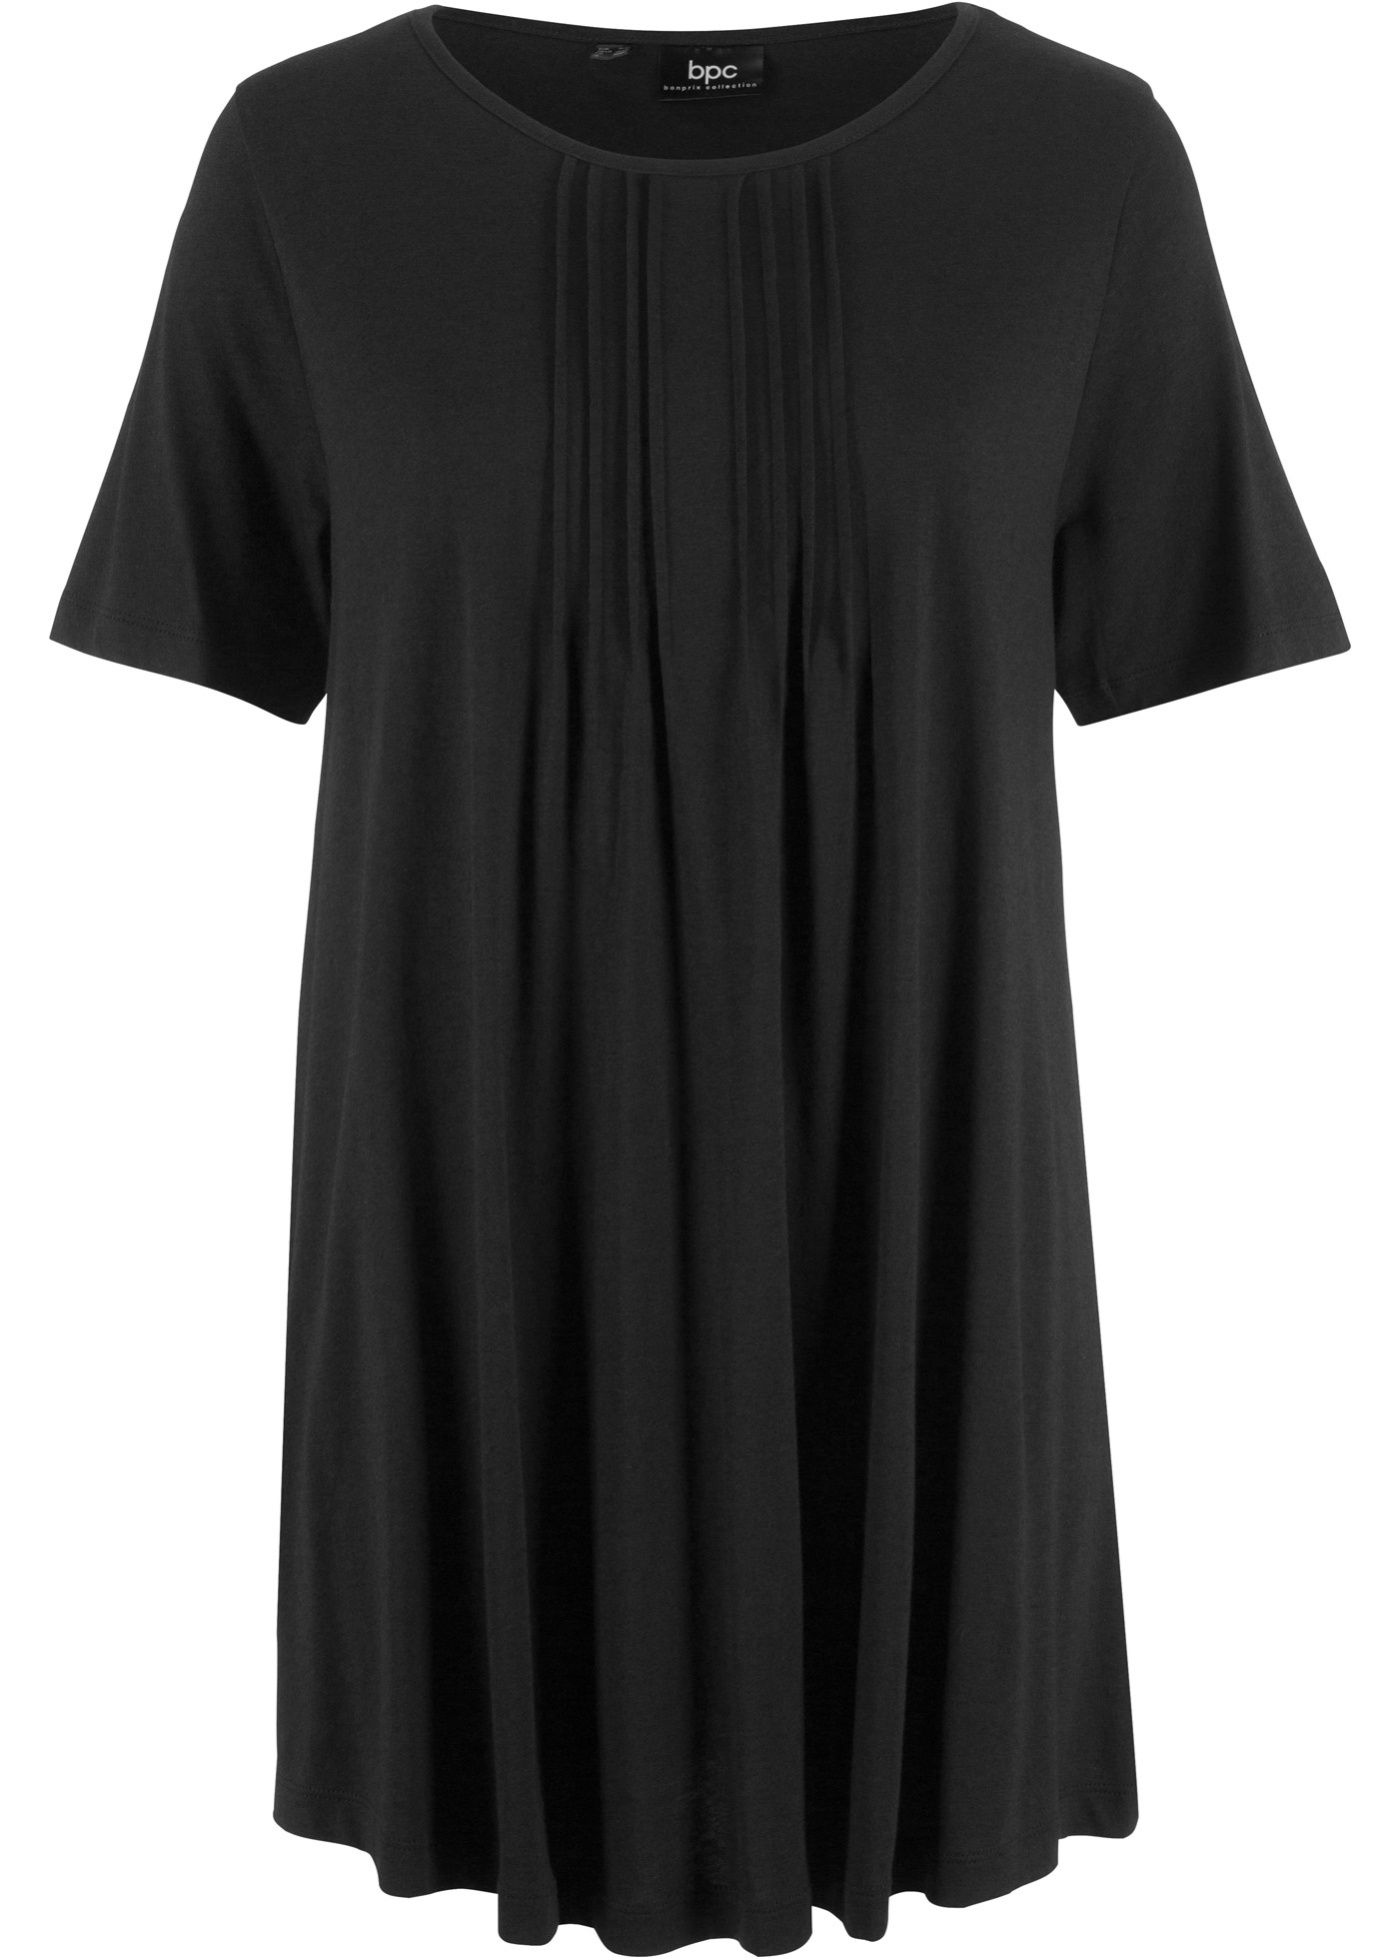 T Shirt In A Linien Form Kurzarm In 2020 Shirts T Shirt Und T Shirt Damen